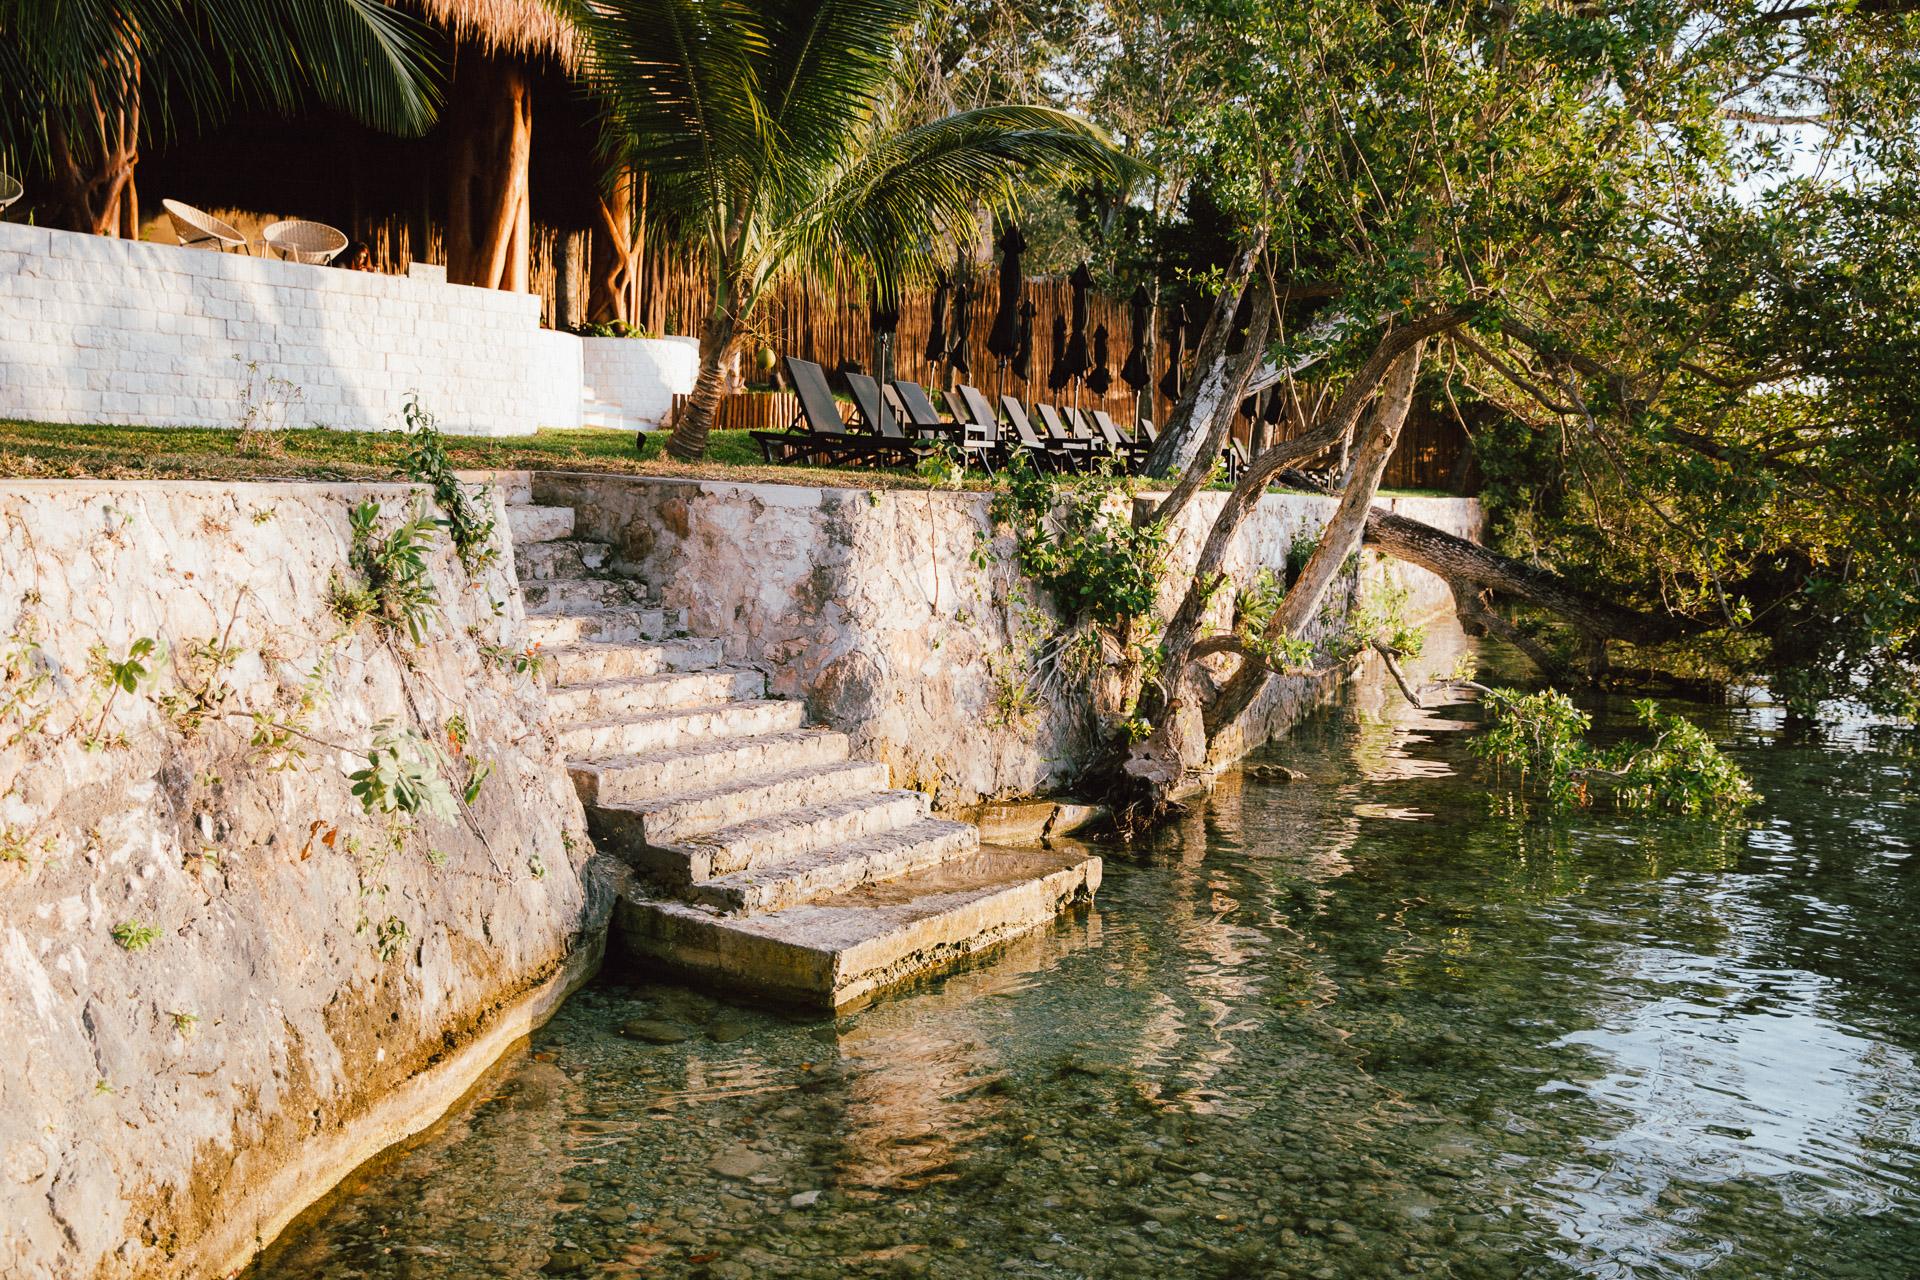 mexico-luxury-hotel-photographer-riviera-maya-mia-bacalar-11.jpg